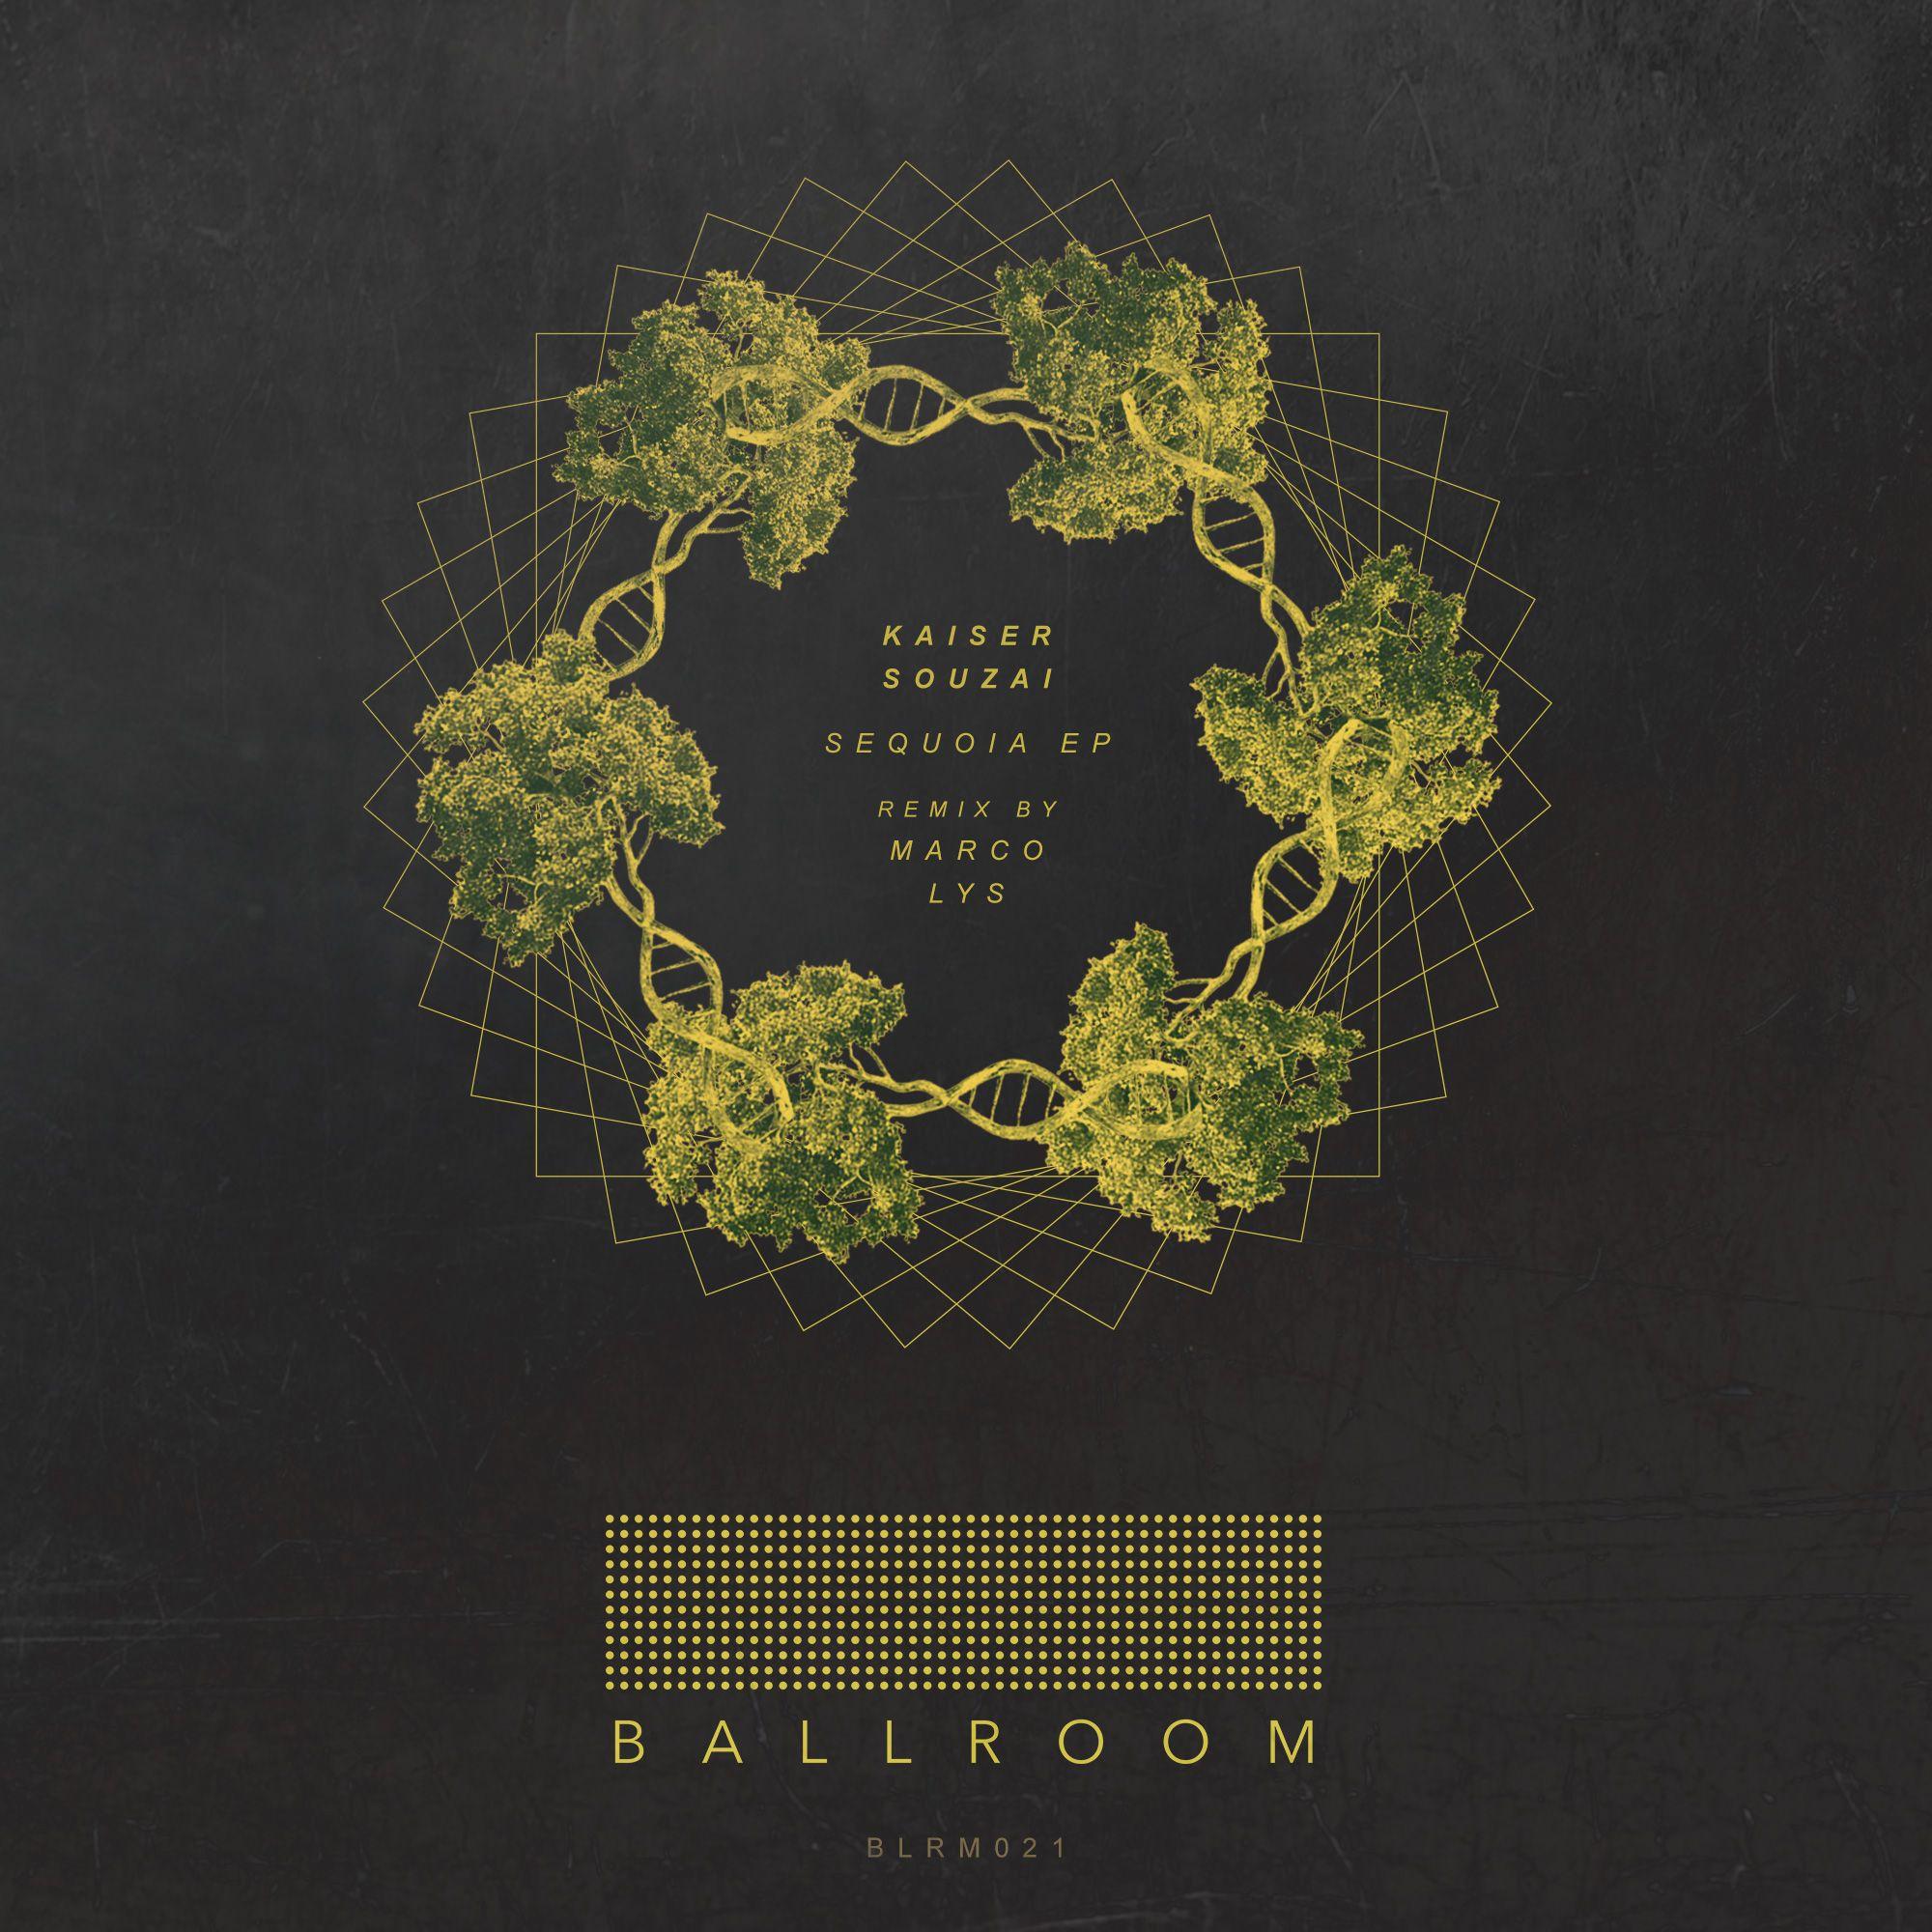 ballroom-kaisersouzai-sequoiaep.jpg